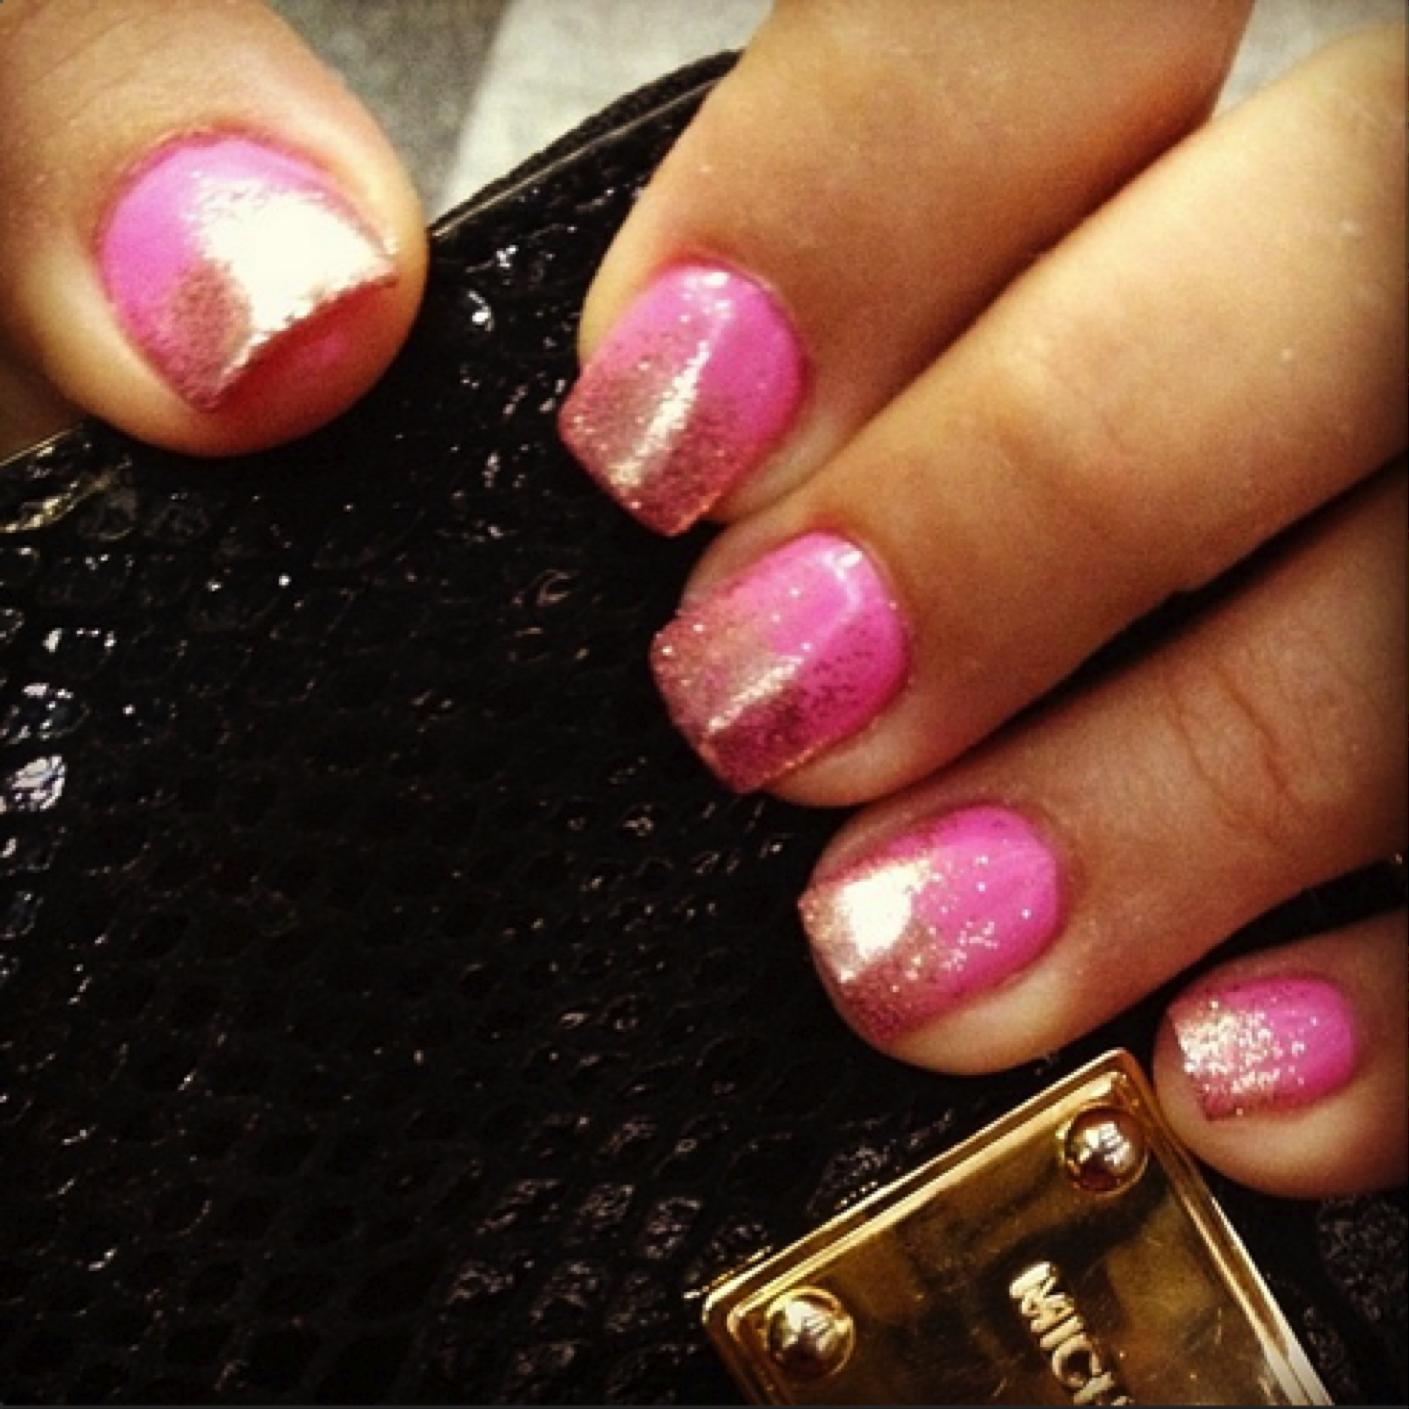 Uñas súper femeninas con glitter. ¡Este efecto degradado es muy original! #segurademi nailart nail art rosa uñas rosas glitter sparkle gelish design moda